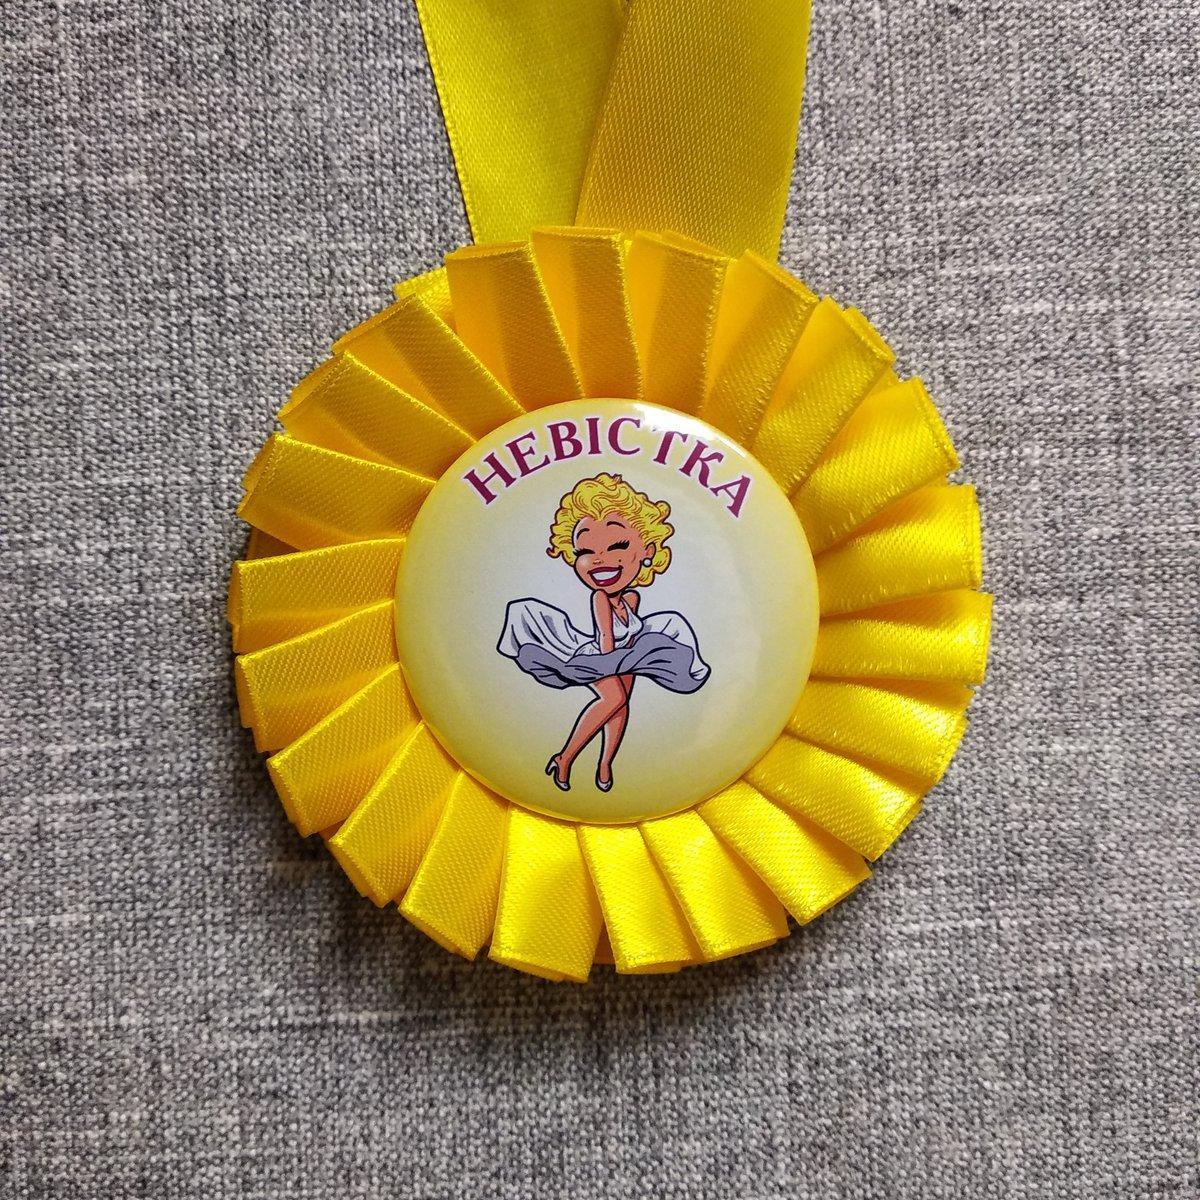 Медаль невестке картинки